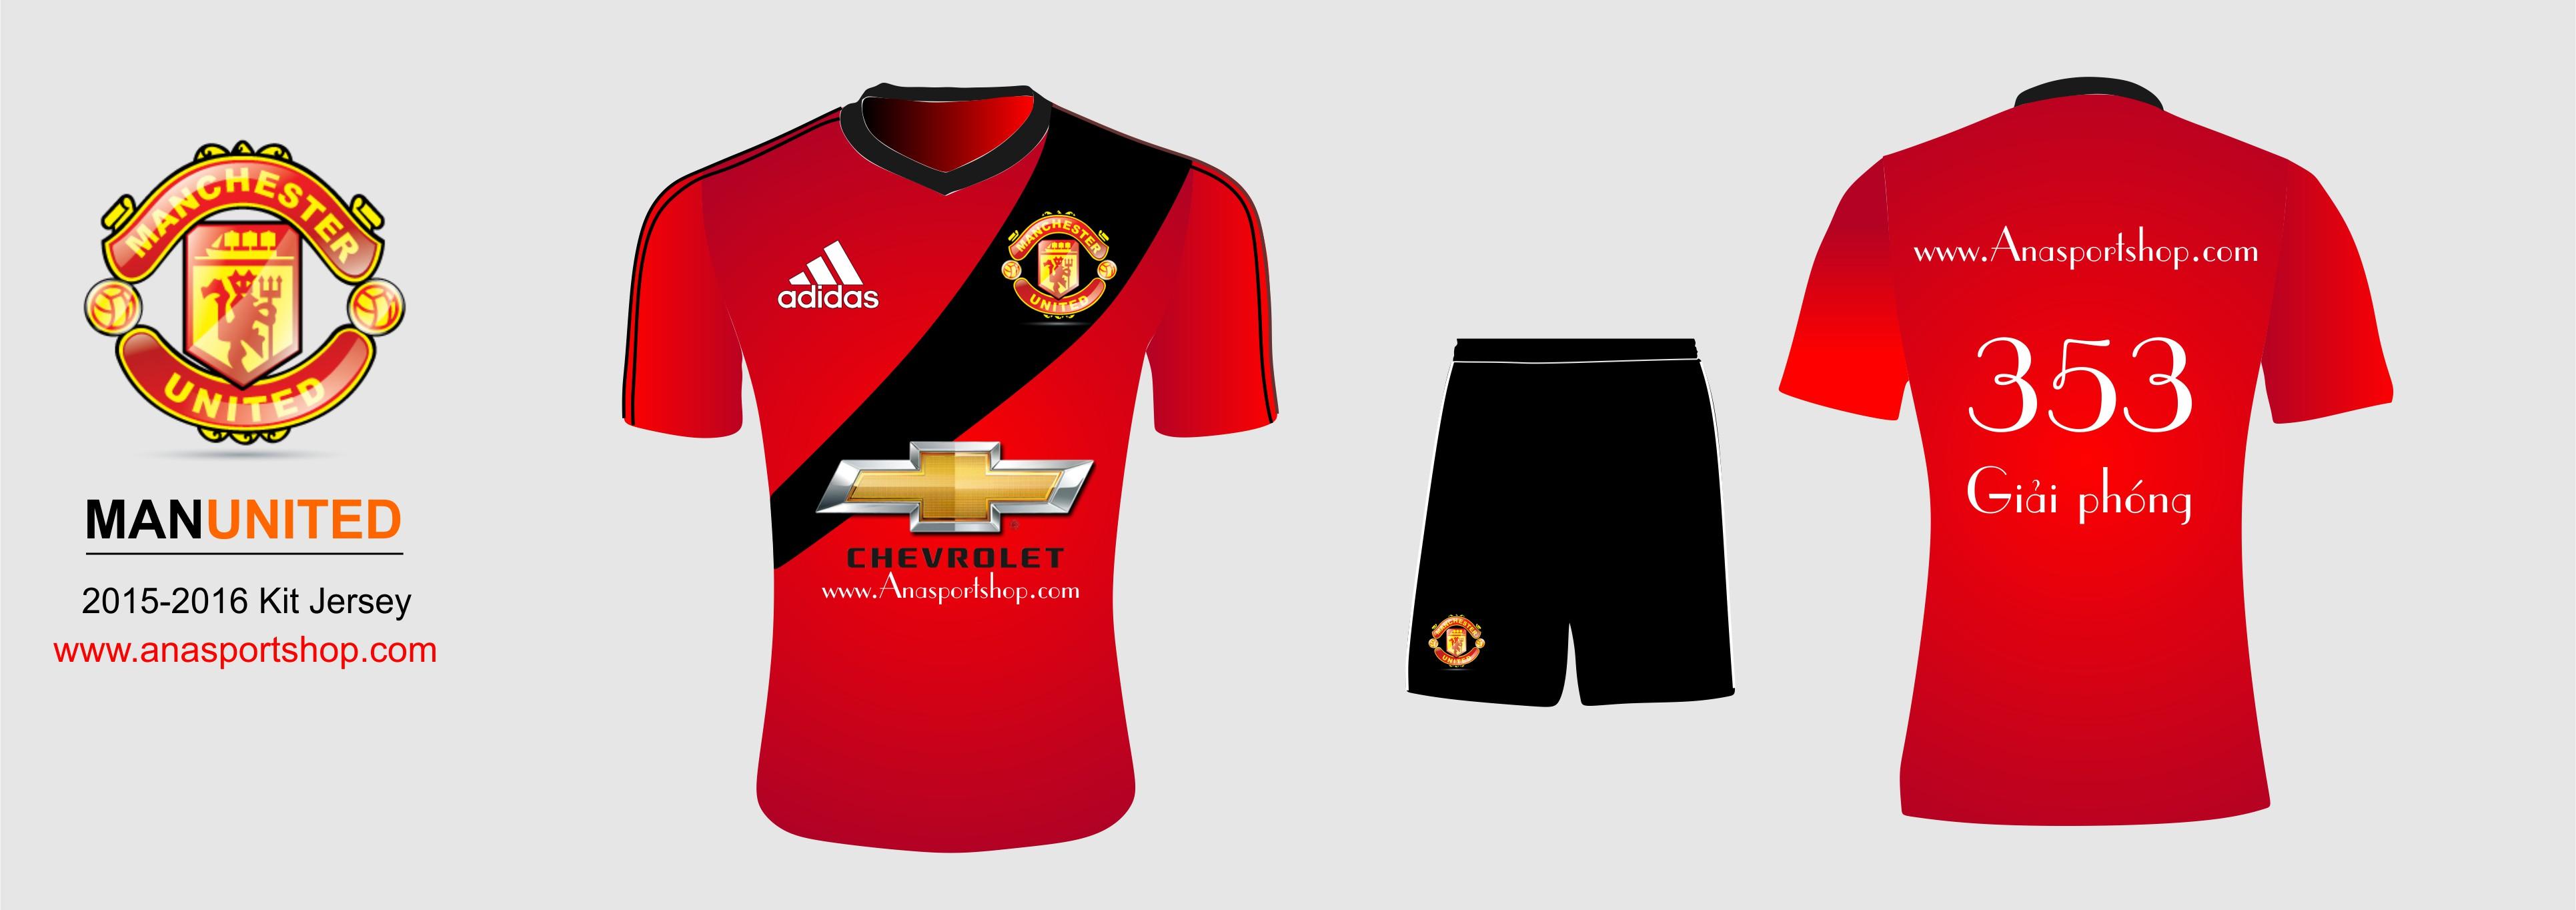 Áo bóng đá Manchester united 2016-2017